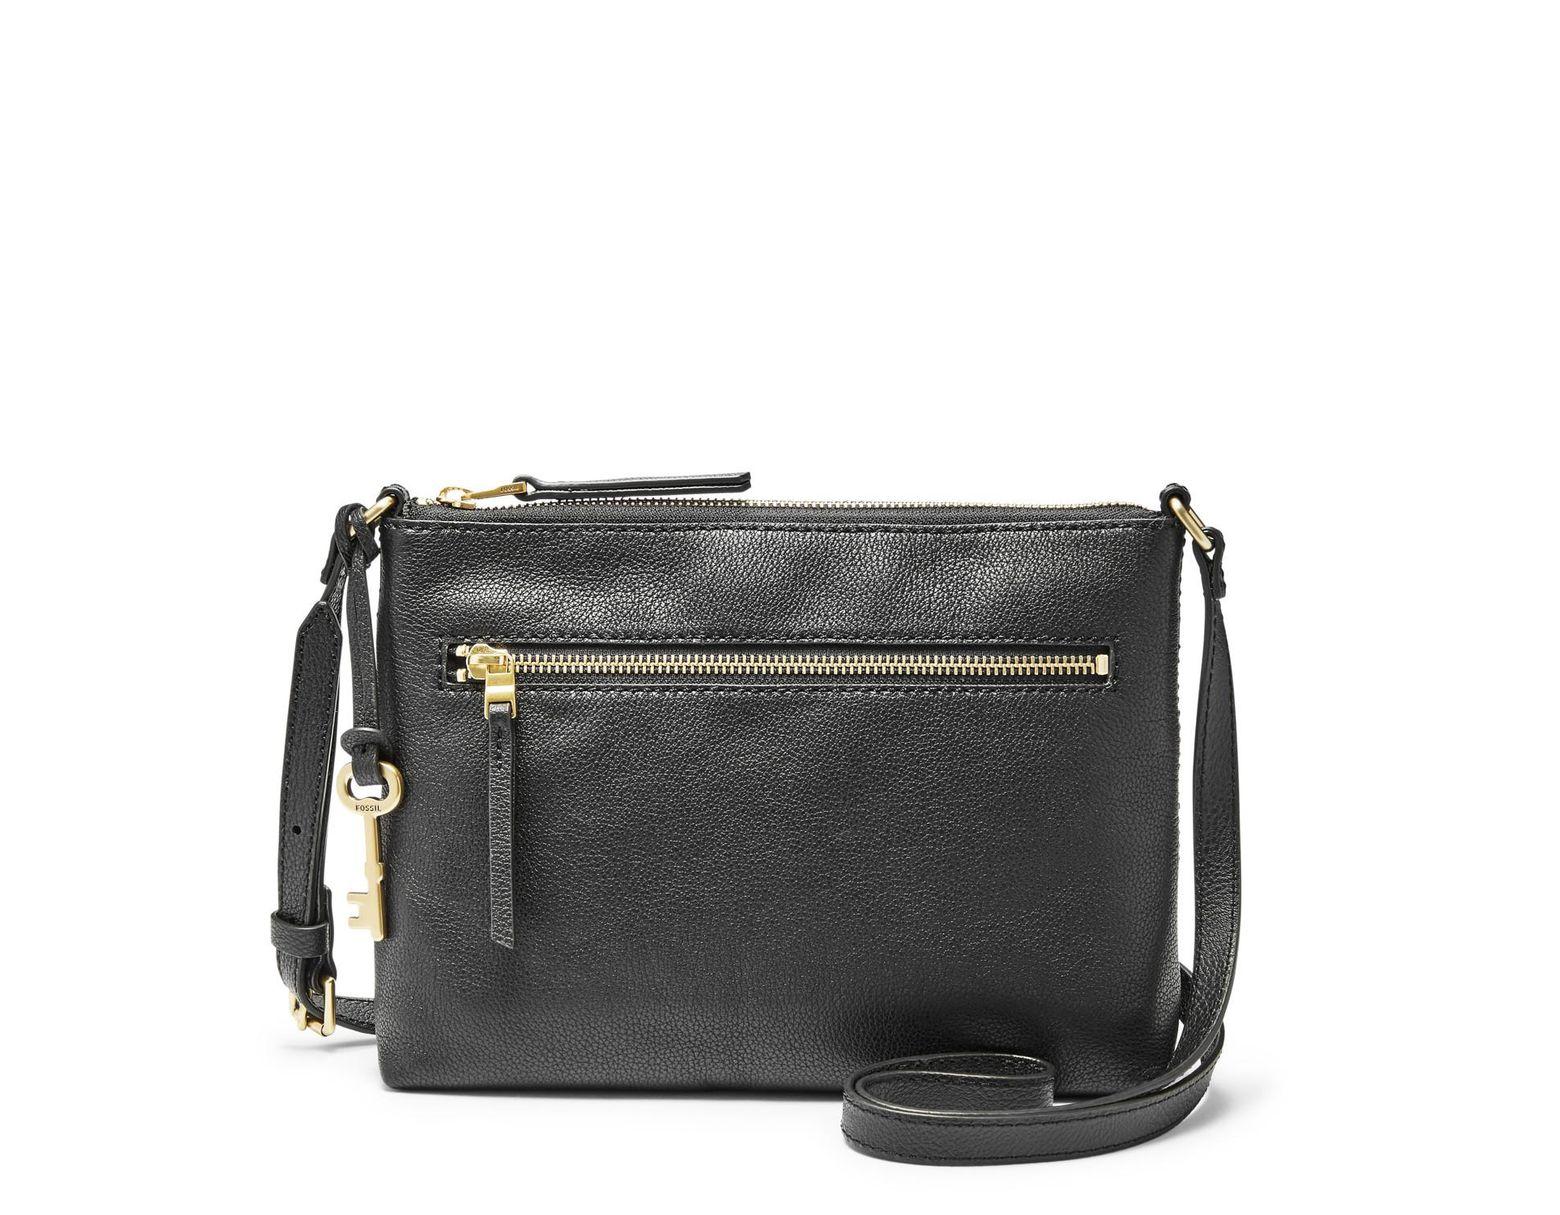 35c1508d0 Fossil Fiona Ew Crossbody Handbags Black in Black - Lyst